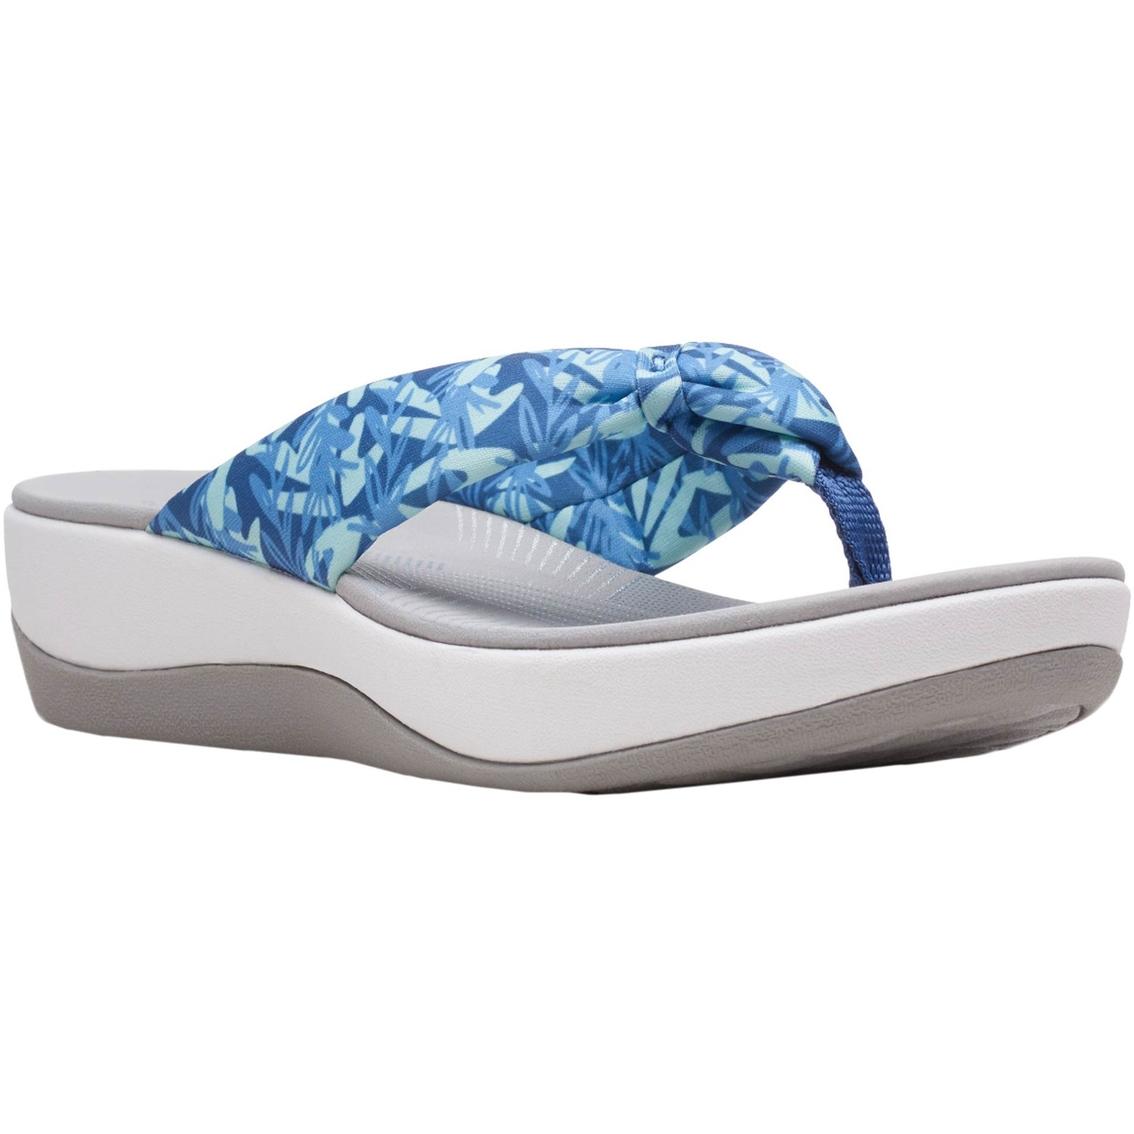 Clarks Women's Arla Glison Sandals